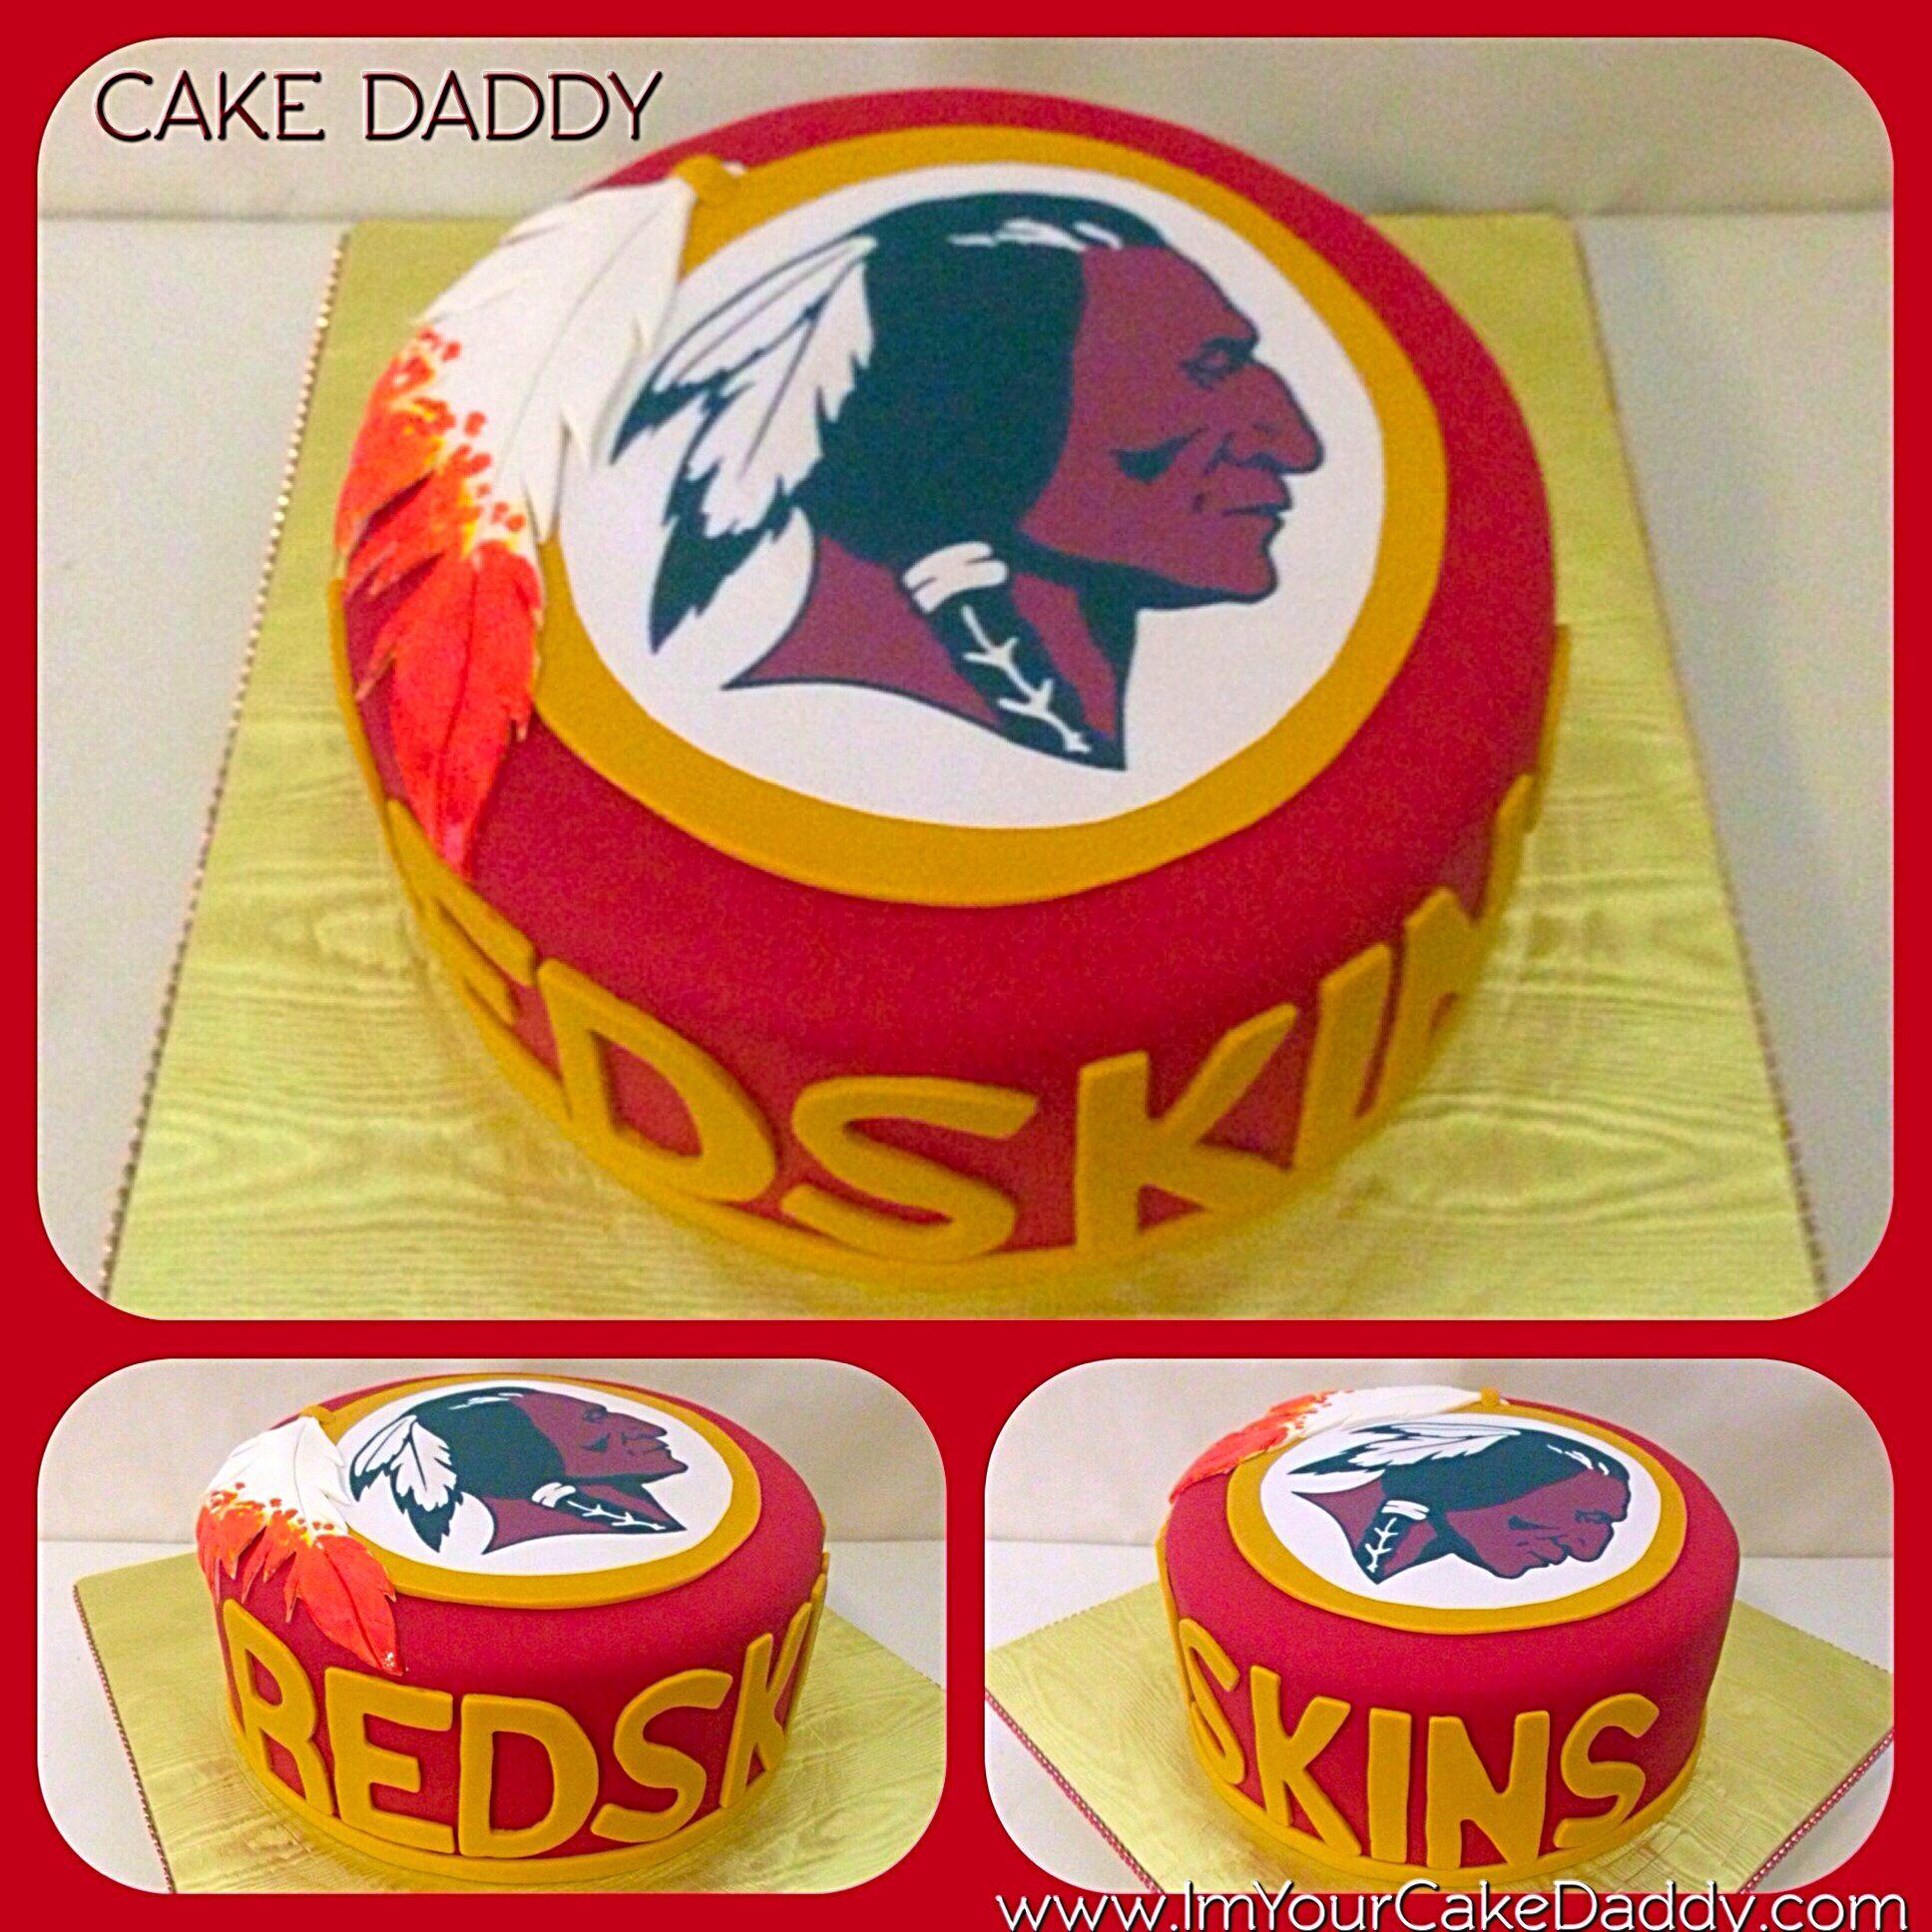 Washington Redskins birthday cake Custom Cakes by Cake Daddy